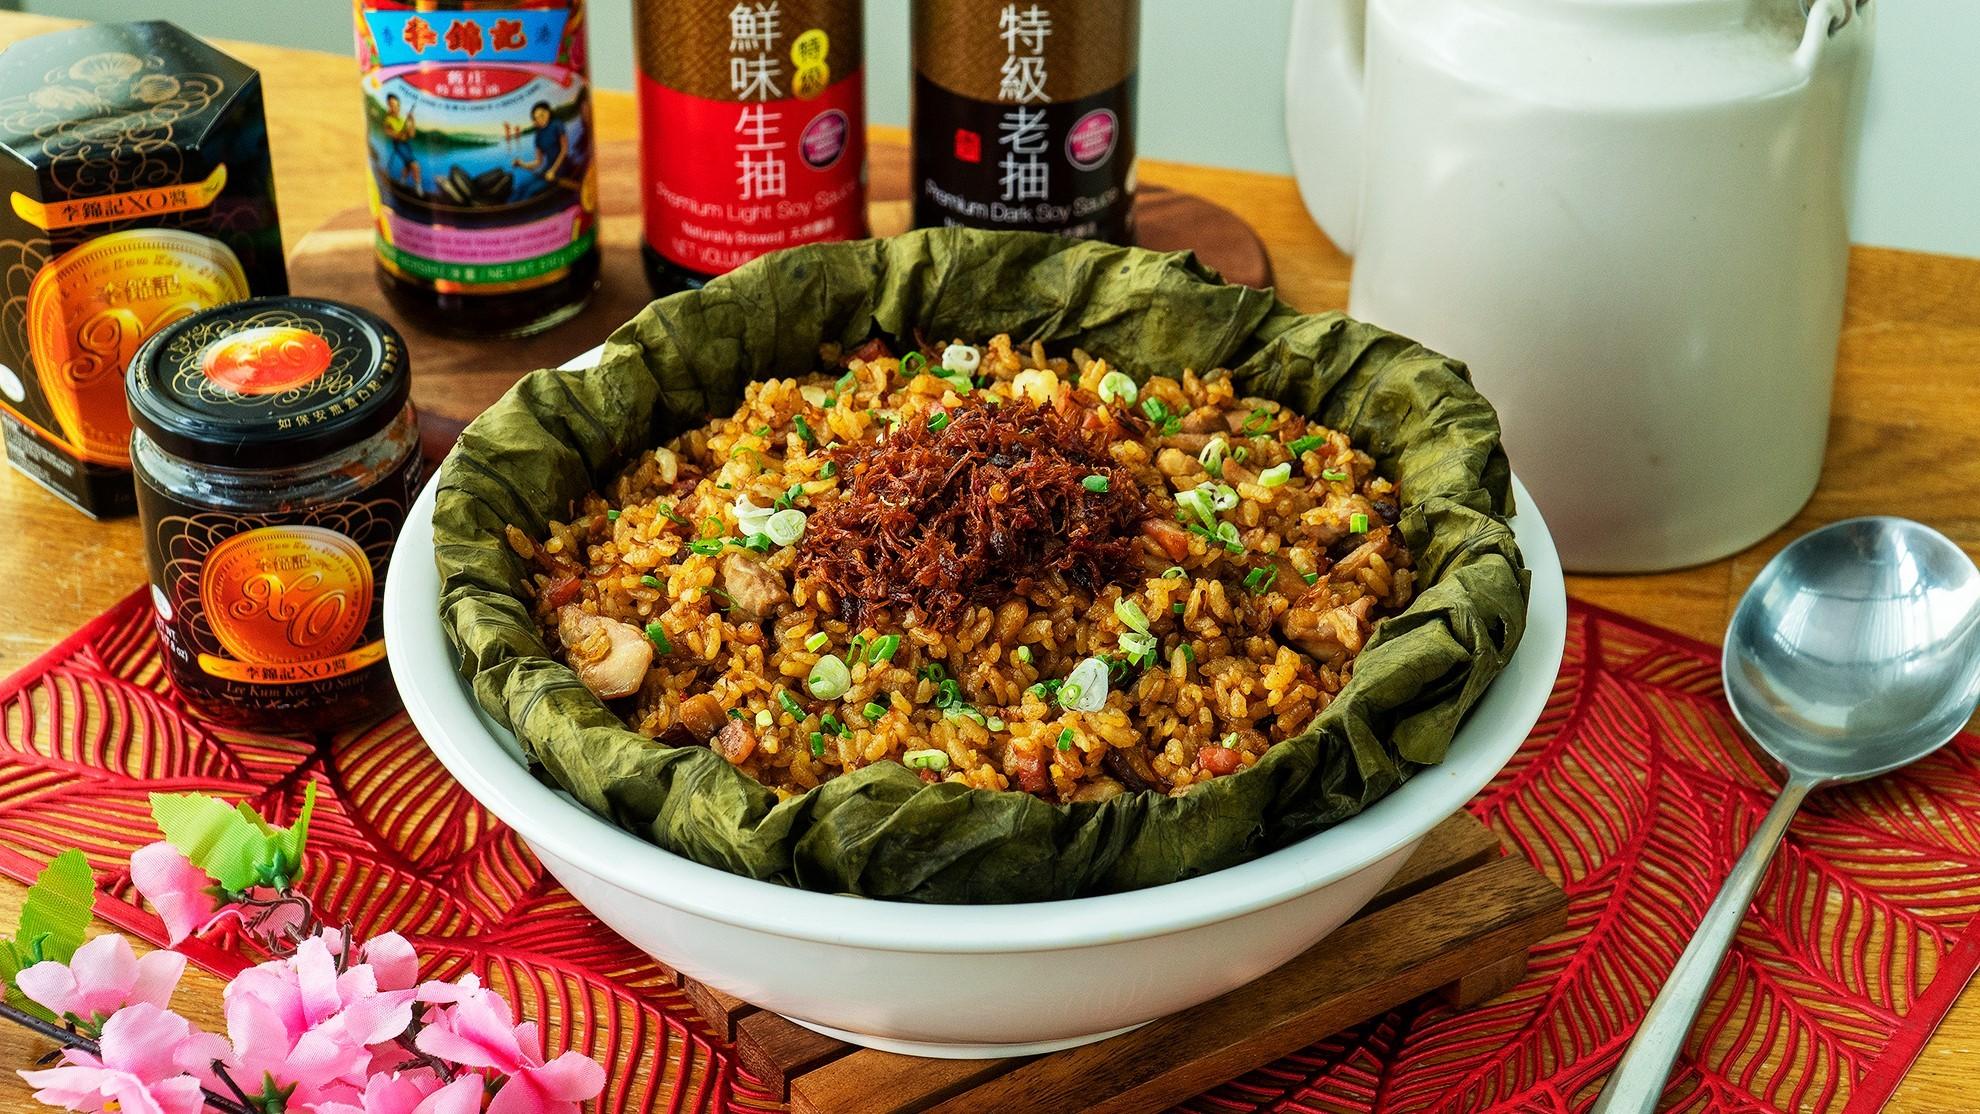 Lotus Leaf Rice - 荷叶饭